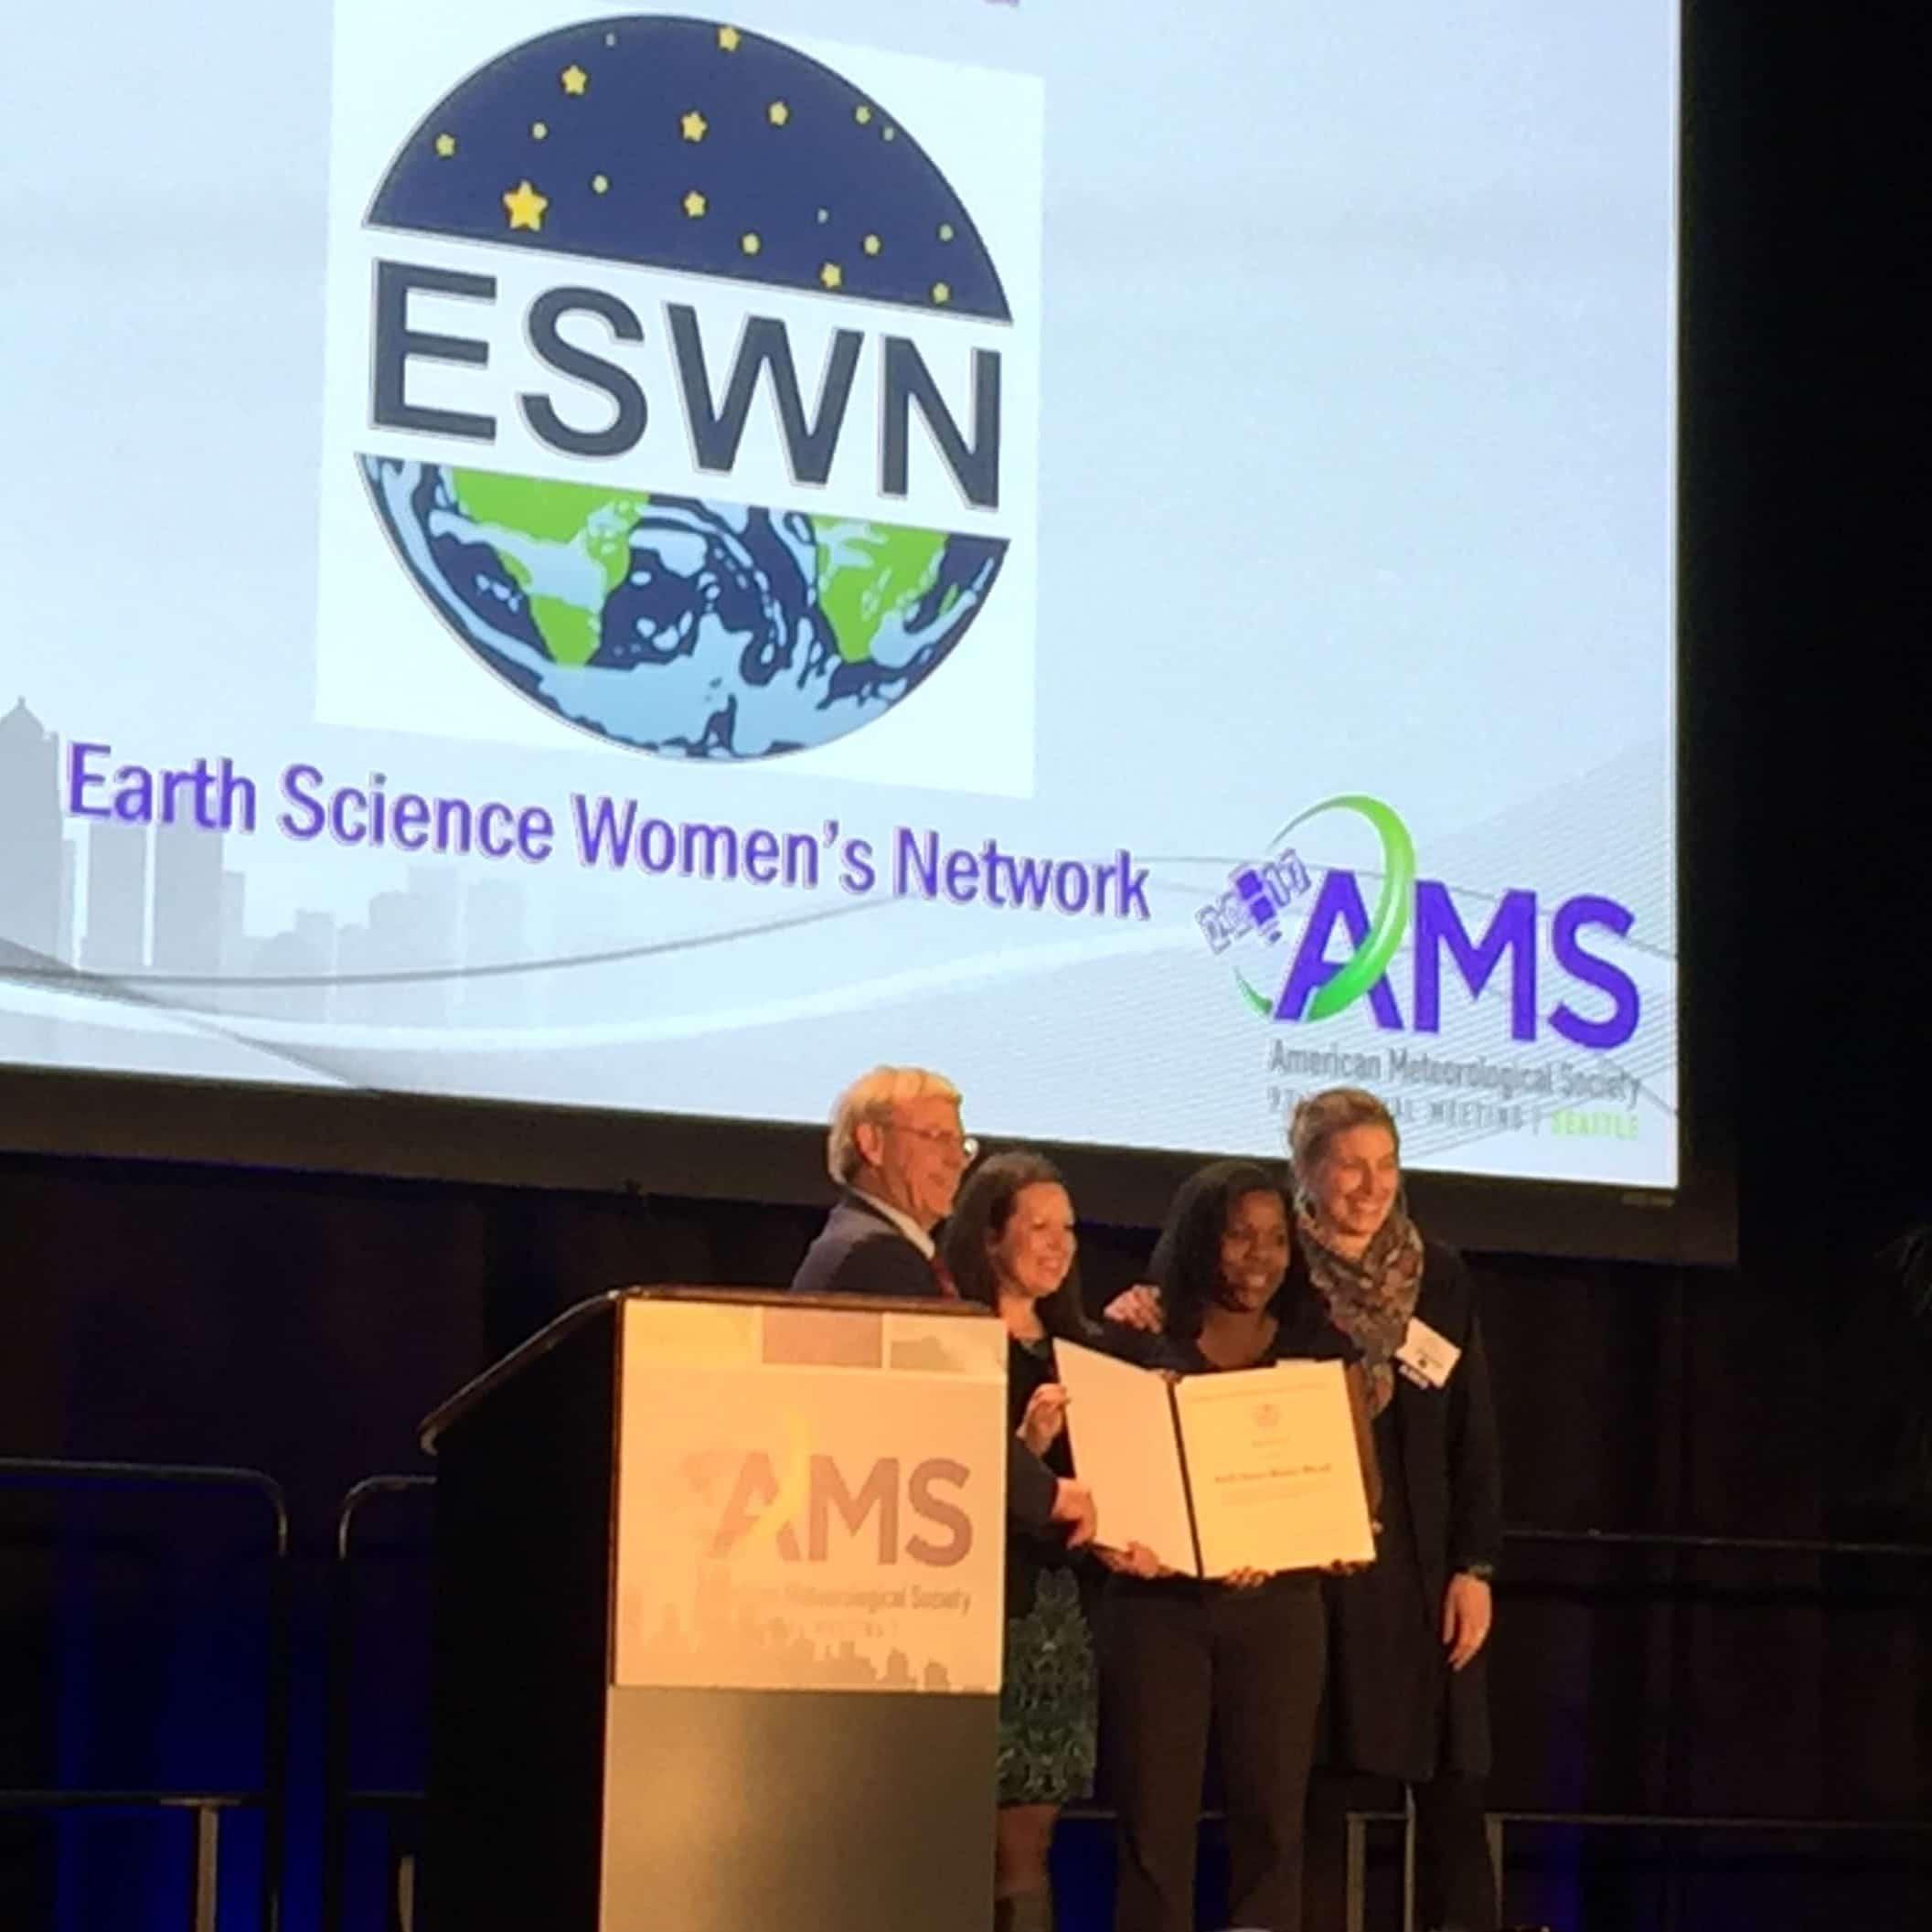 AMS award photo